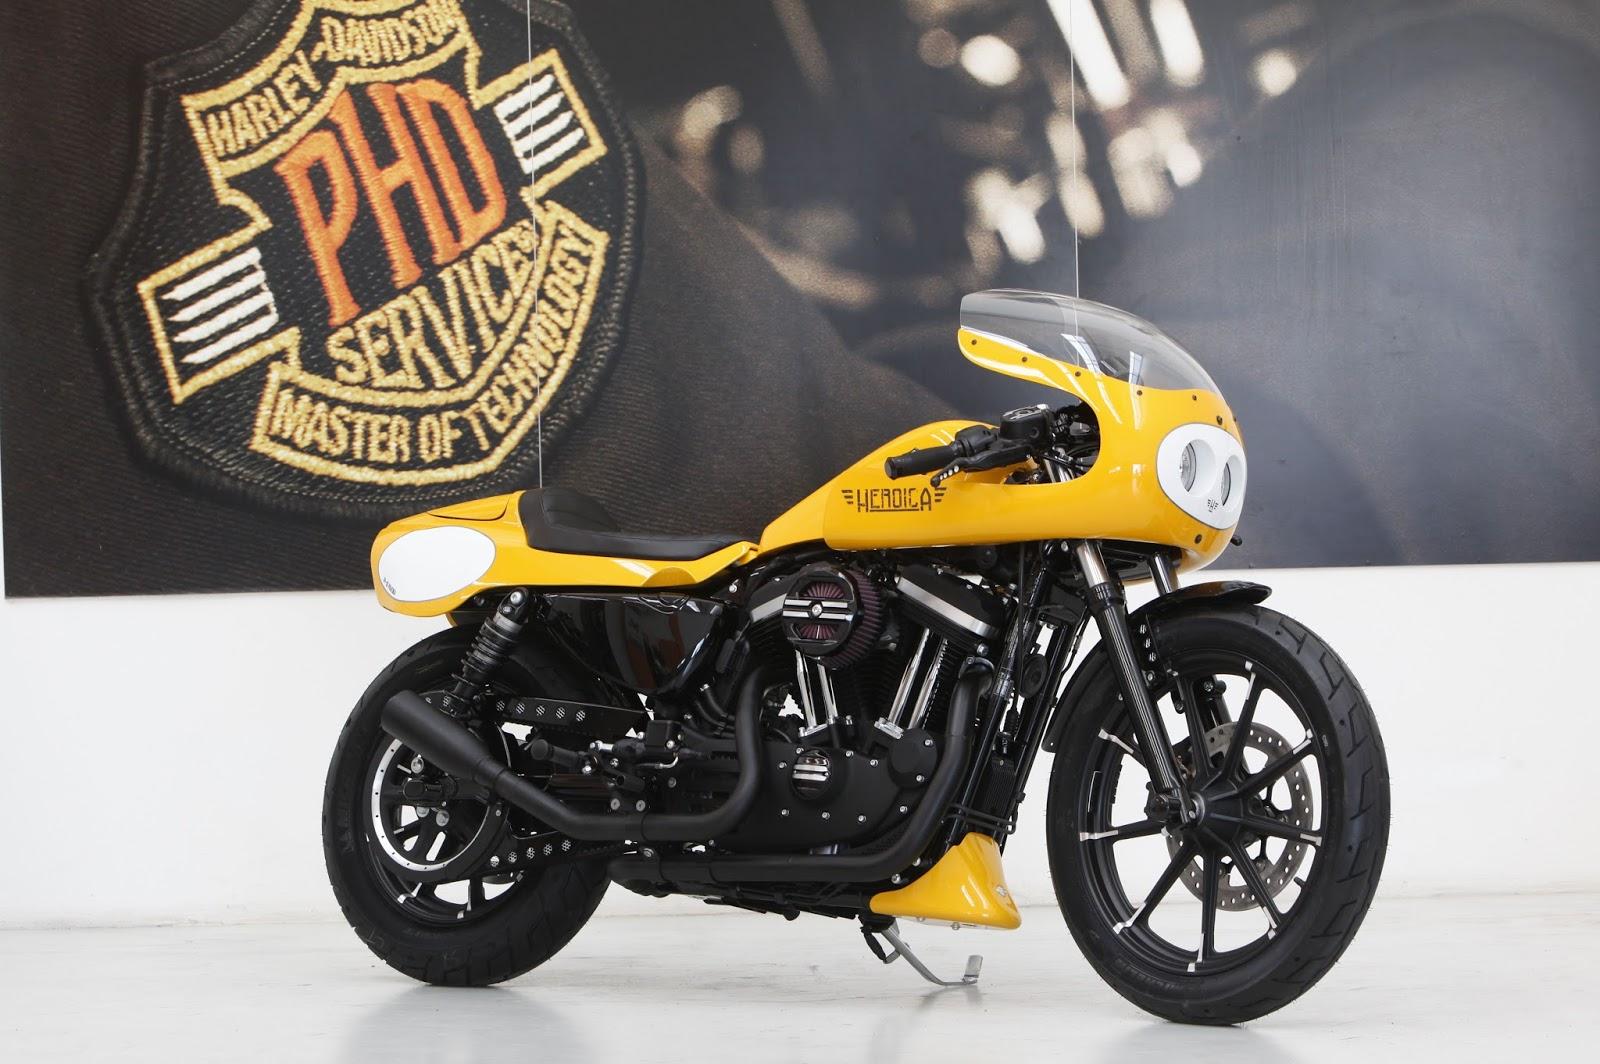 Racing Caf U00e8  Harley Sportster 883  U0026quot Heroica U0026quot  By H